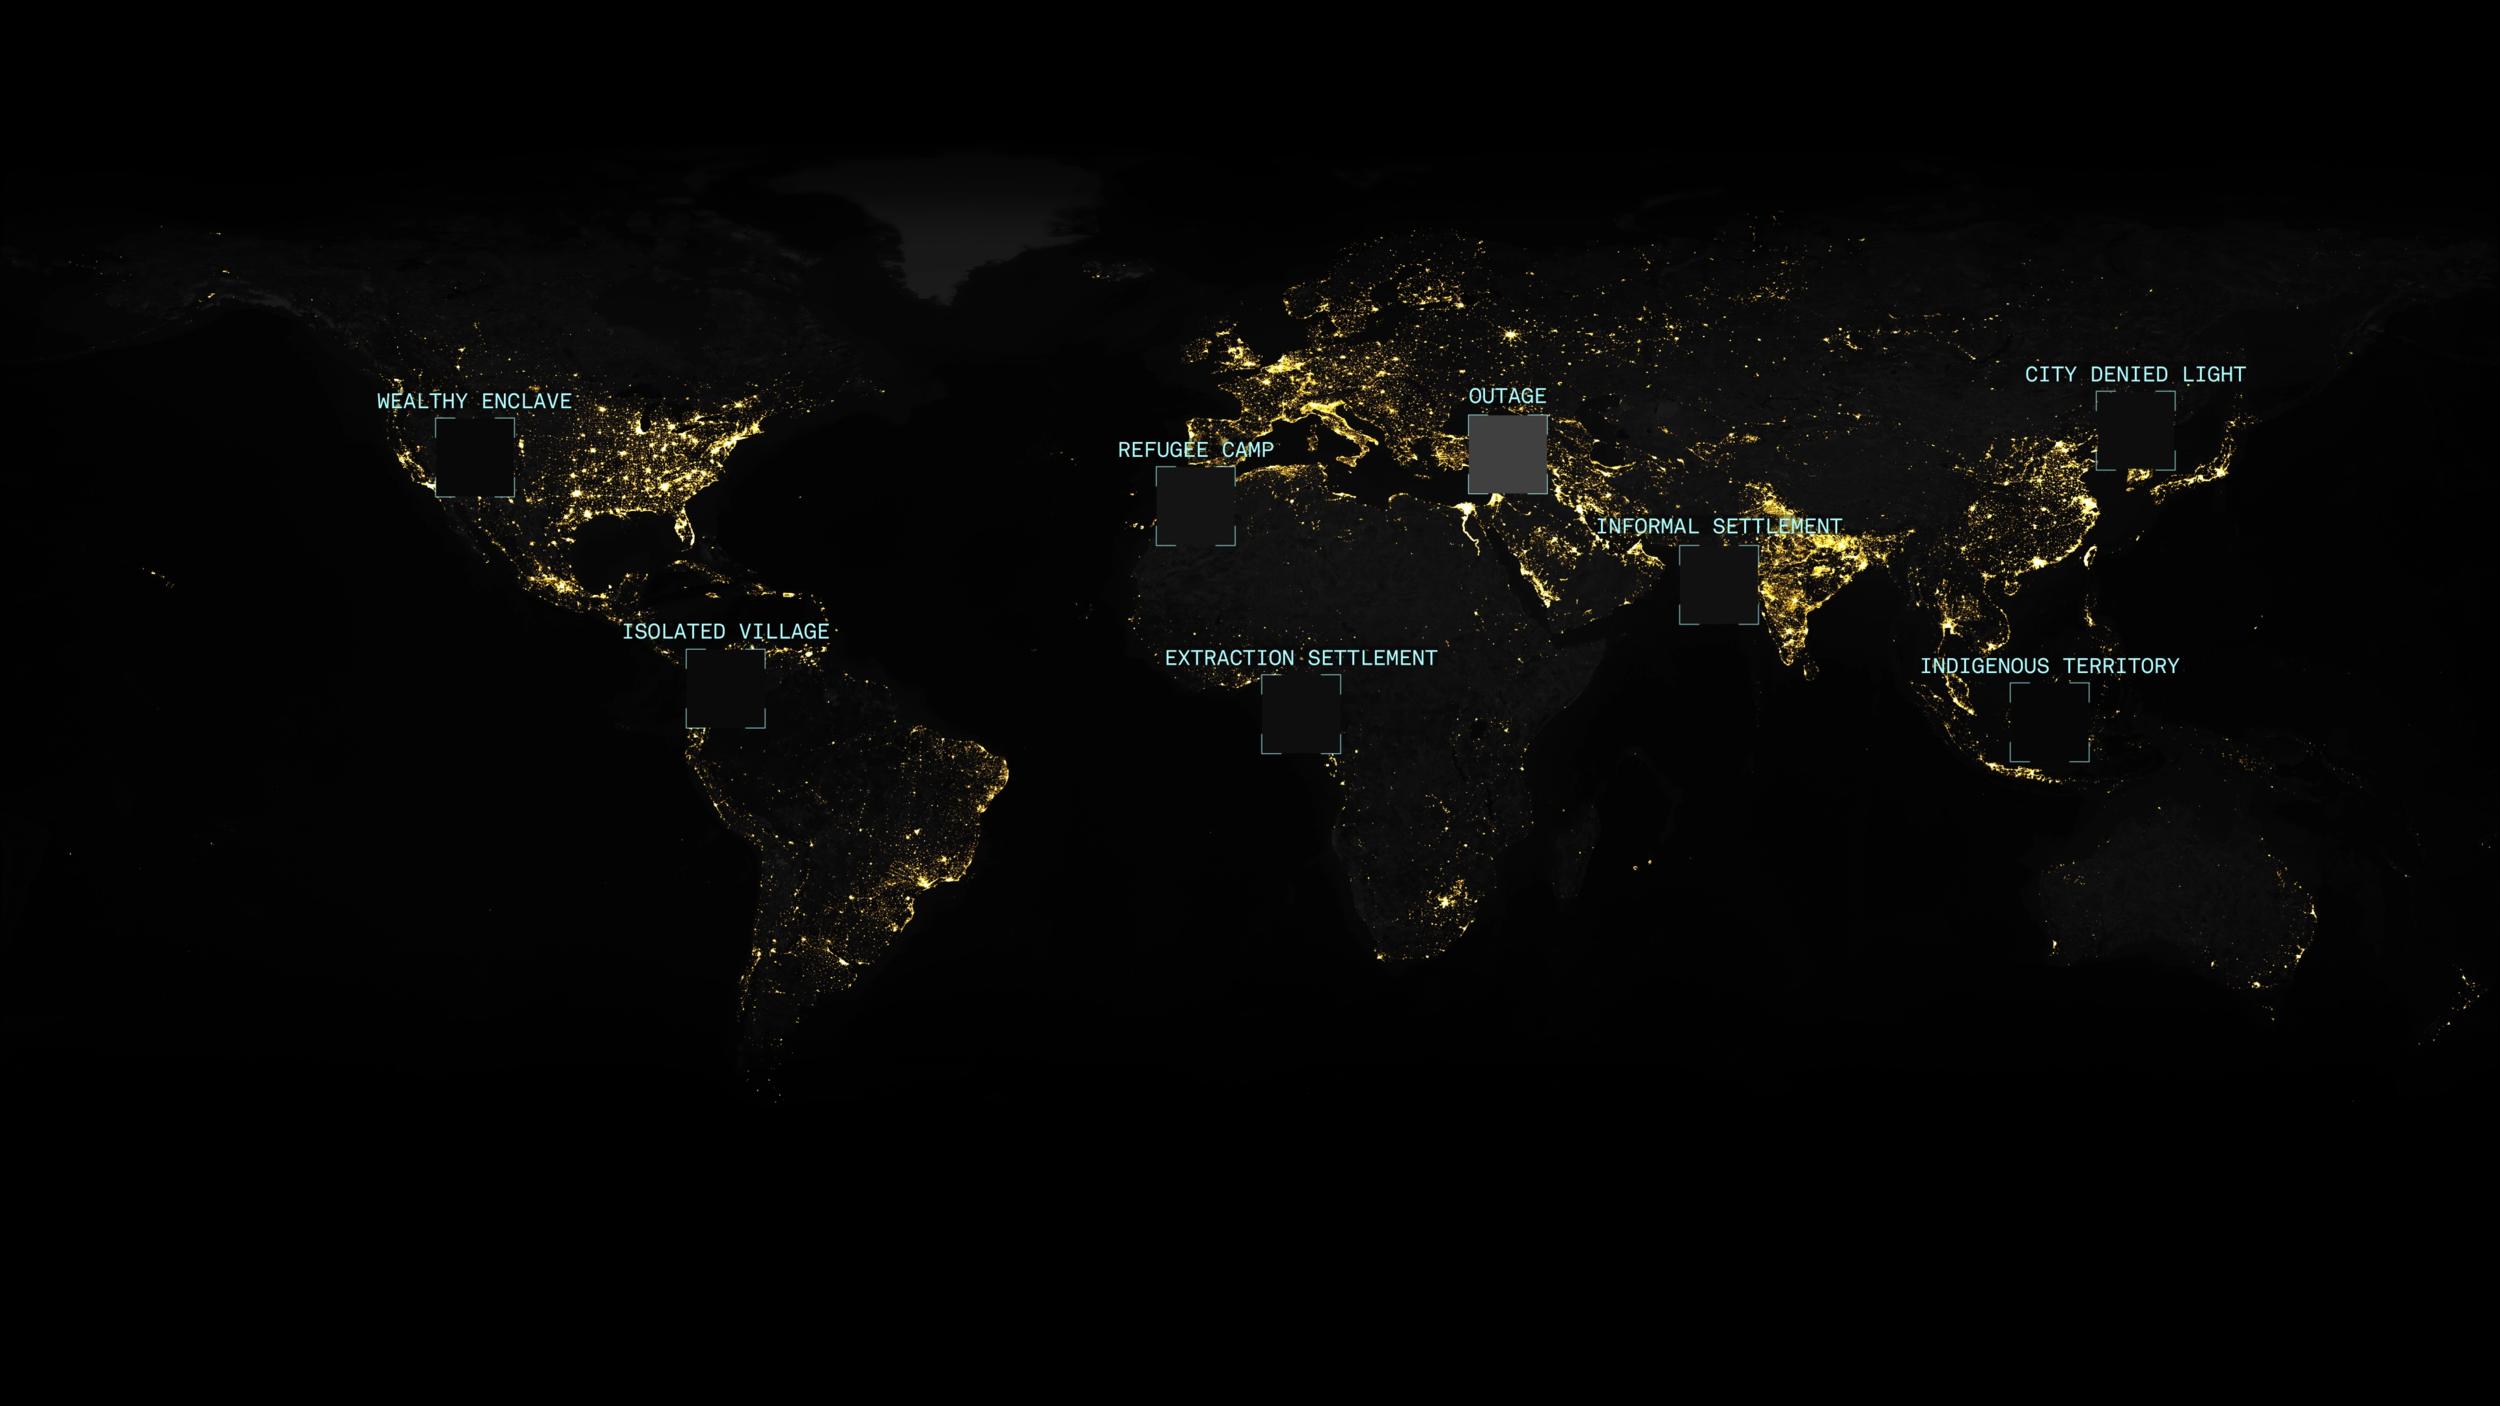 8_Dark_Locations-798.png